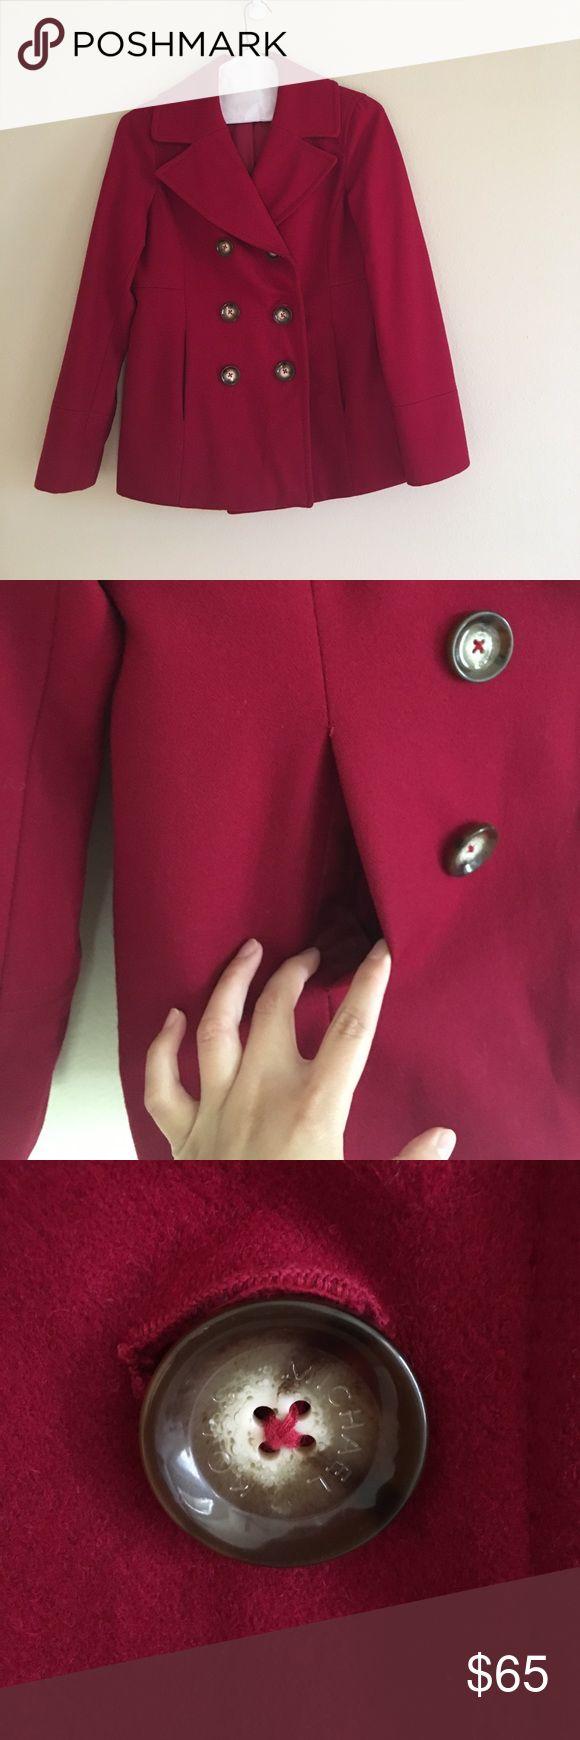 Michael Kors Pea Coat No flaws. Just dry cleaned as well! Michael Kors Jackets & Coats Pea Coats